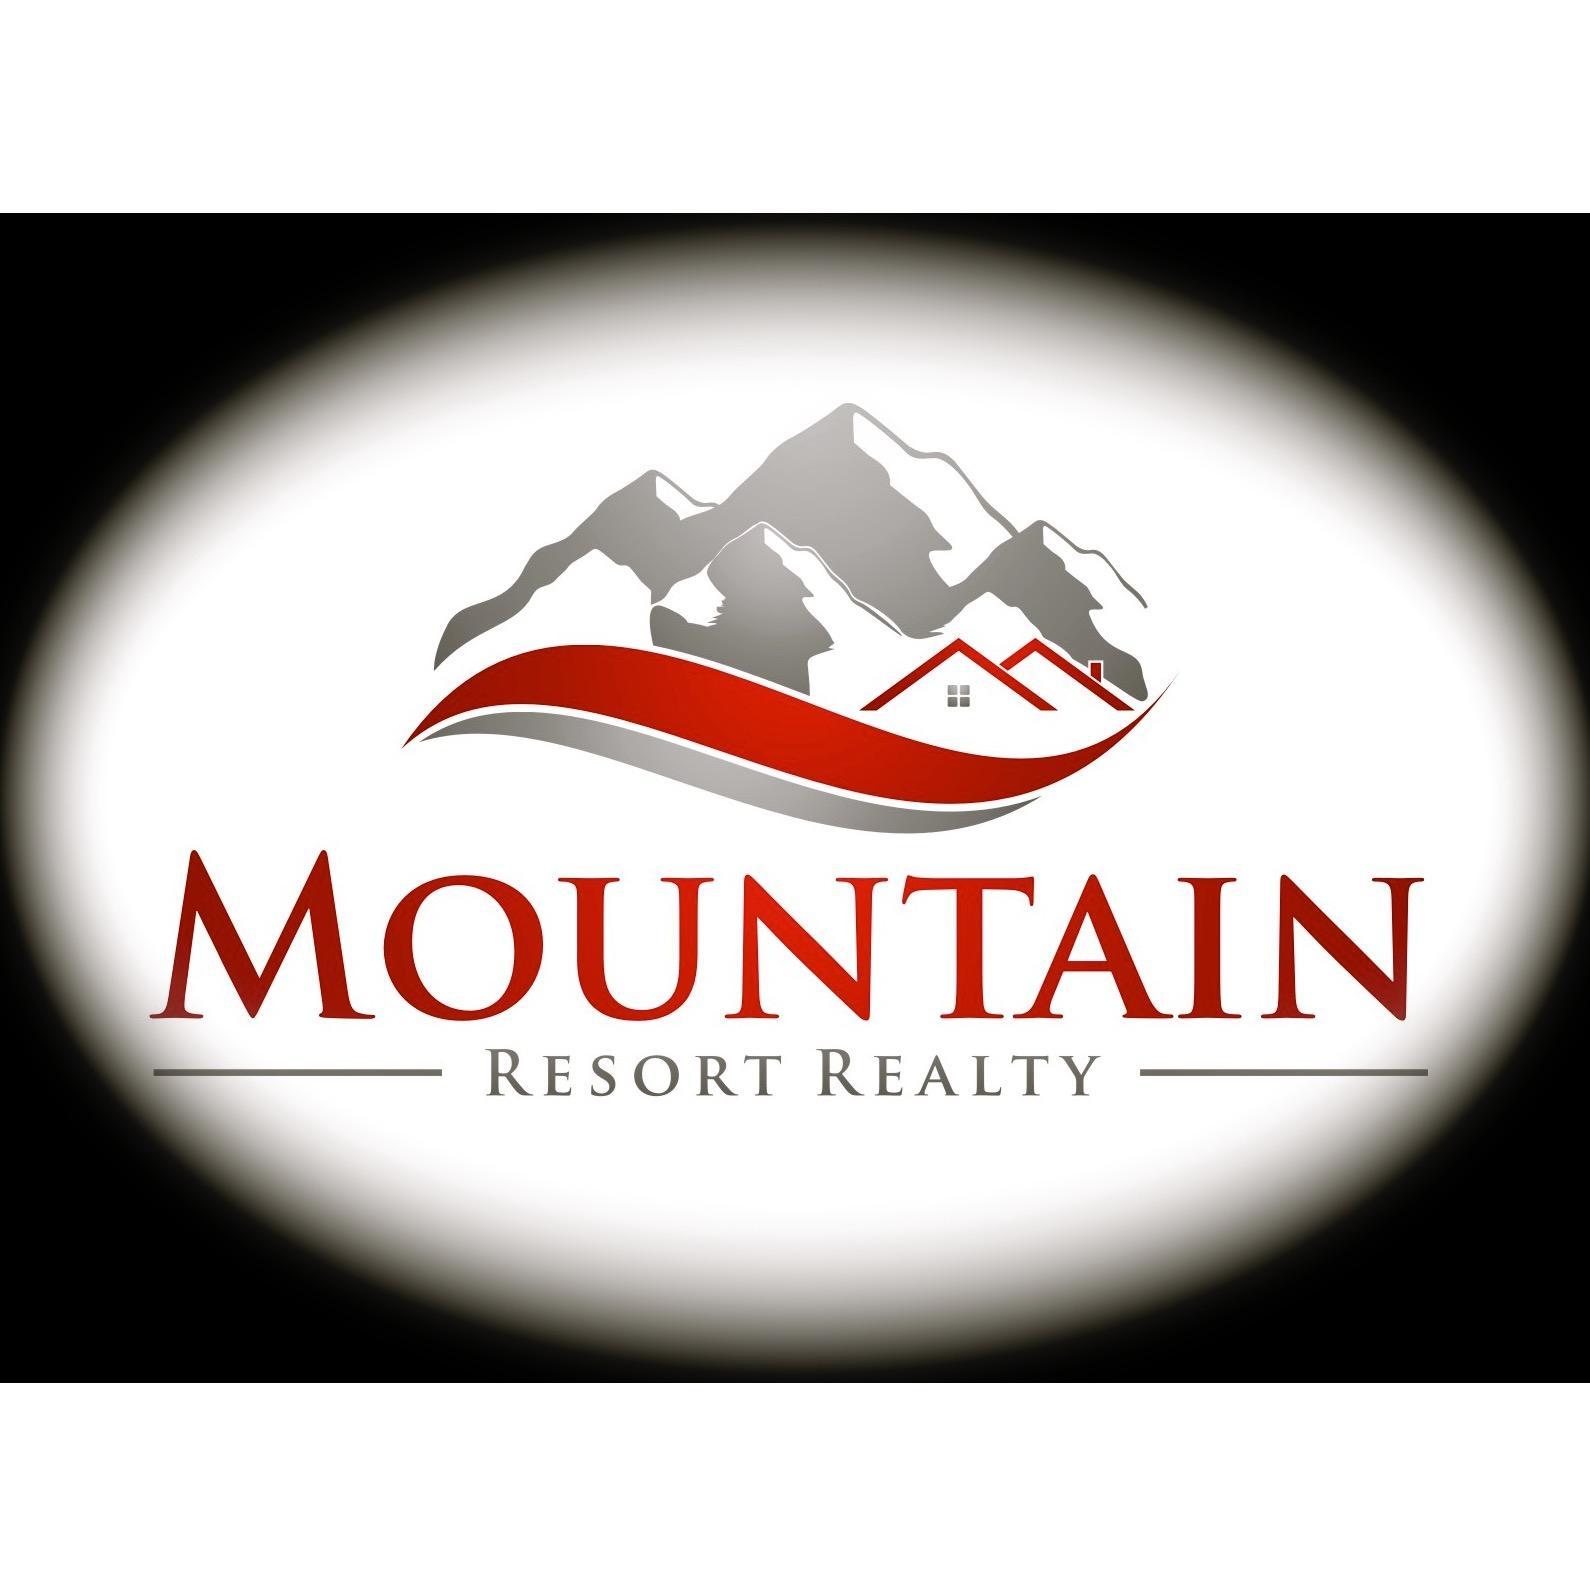 Mountain Resort Realty image 9